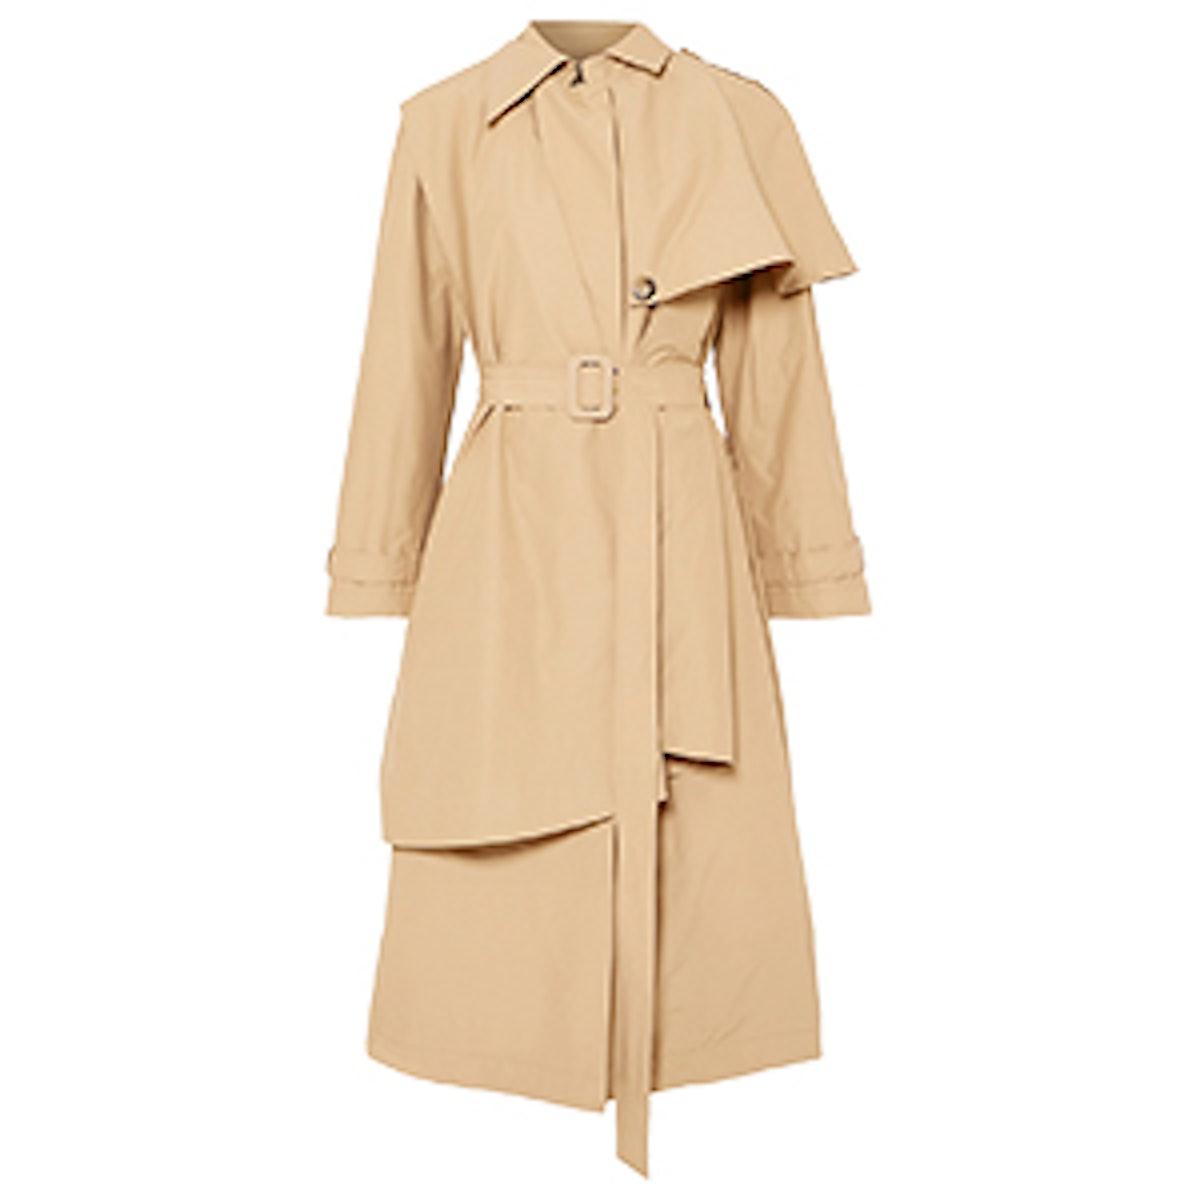 Cape-Effect Cotton-Blend Trench Coat